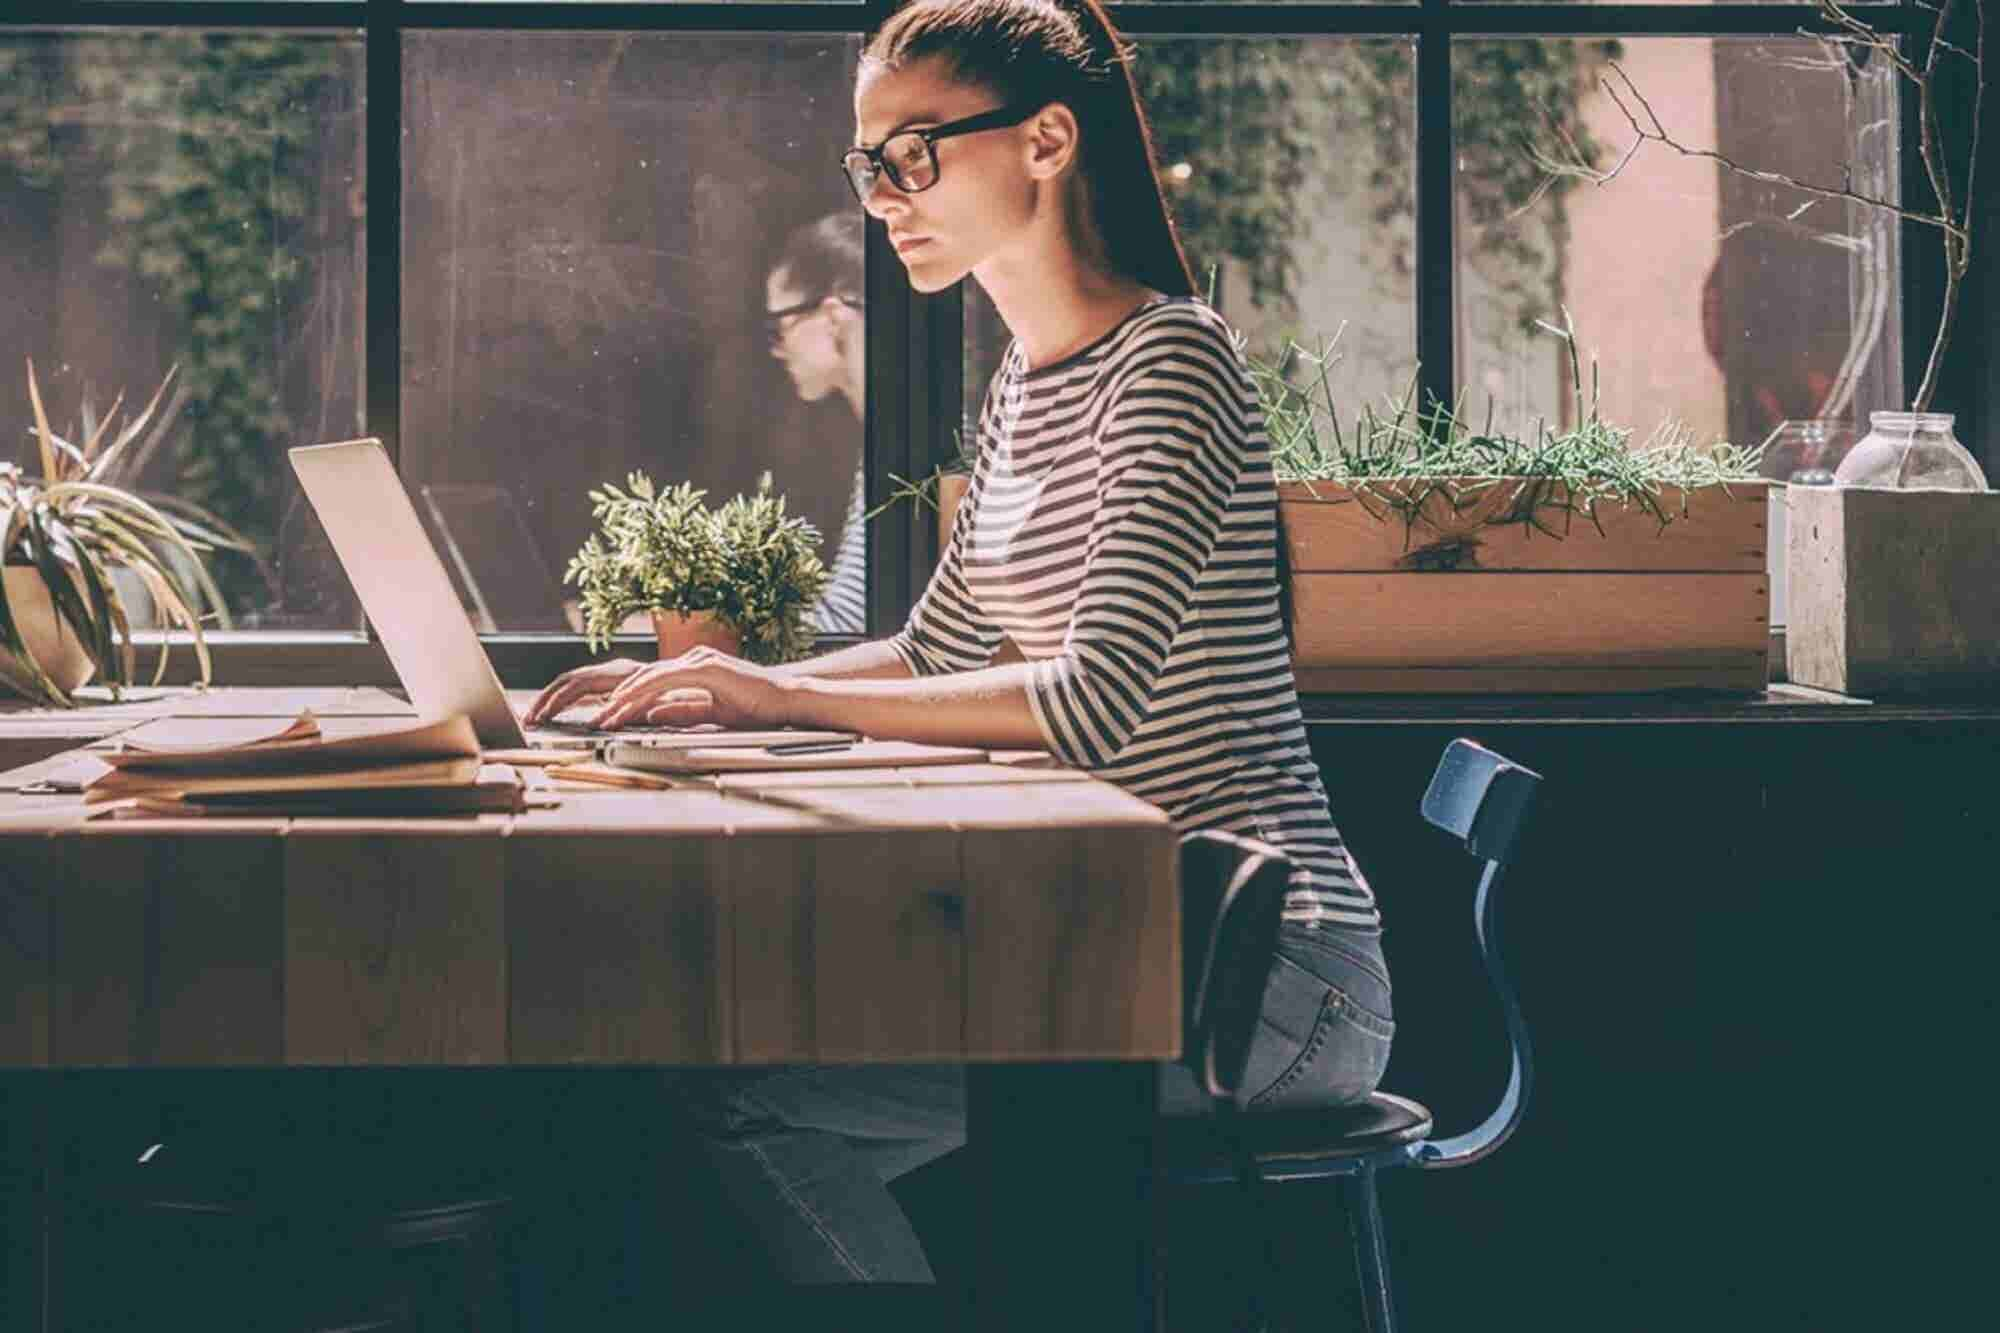 How Important is Self Discipline For Entrepreneurs